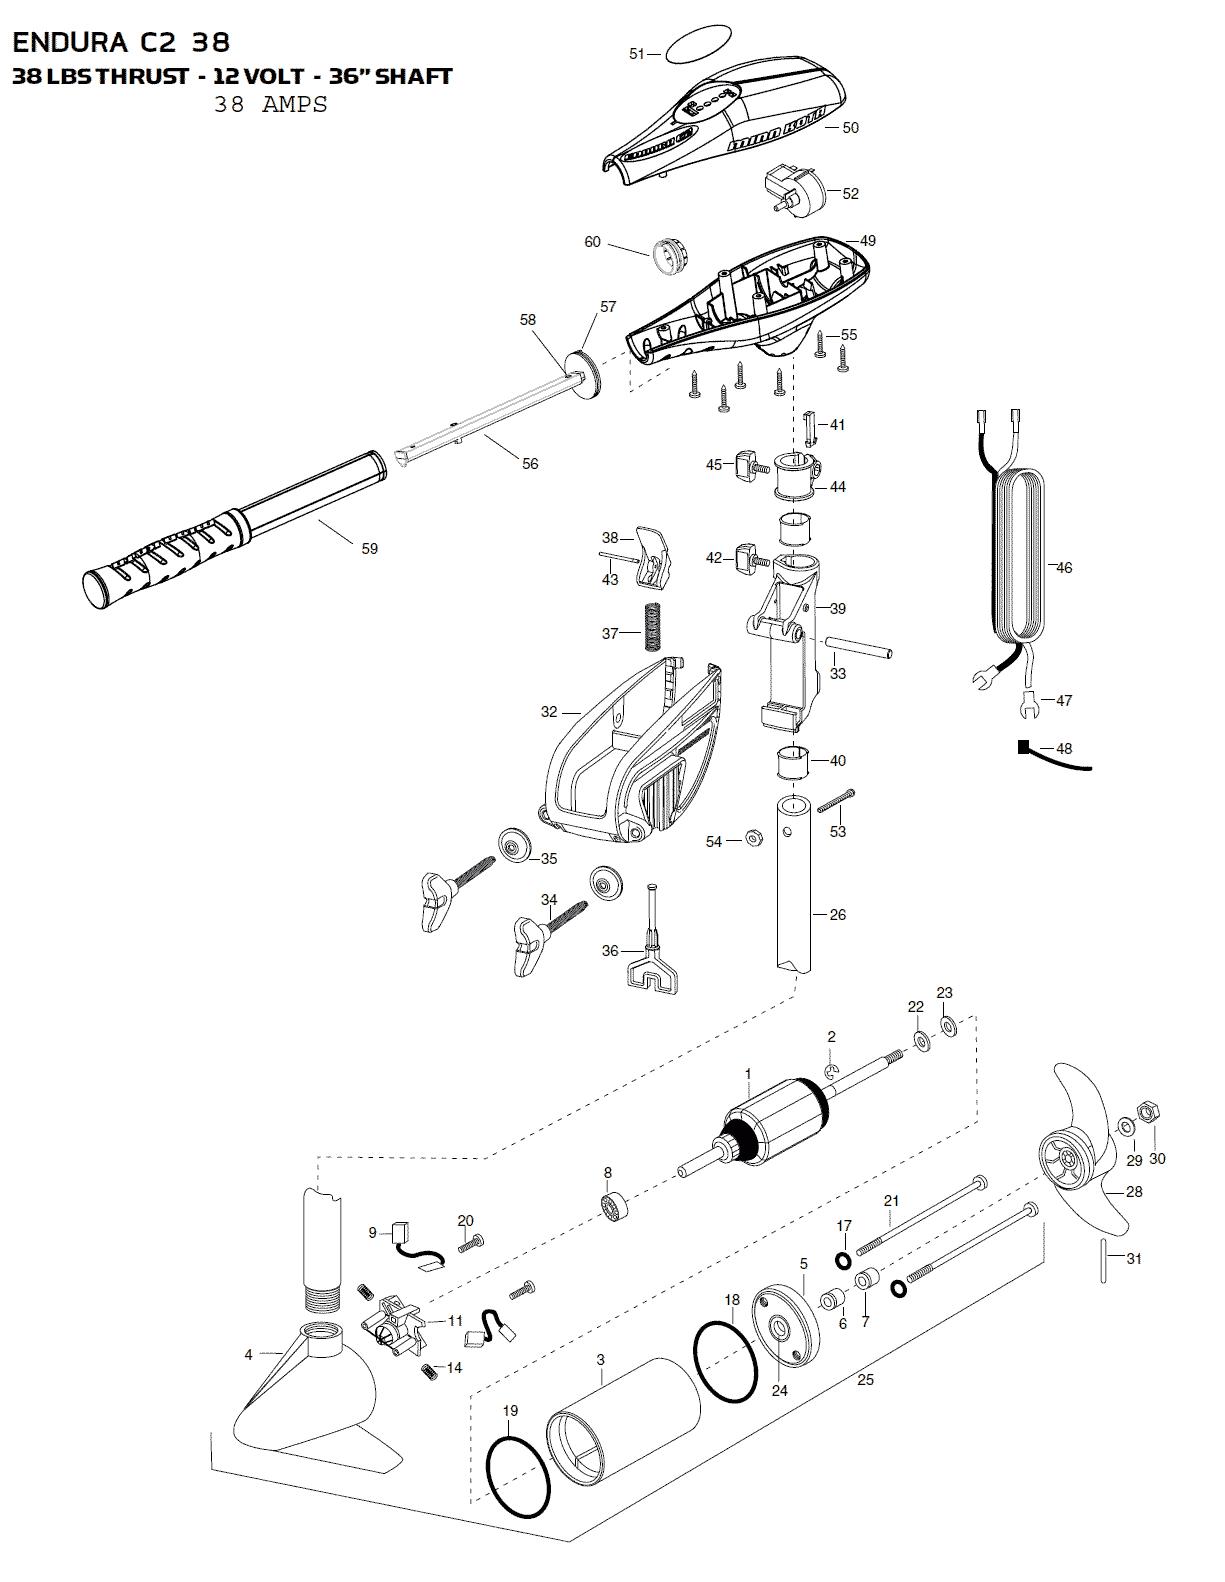 minn kota endura c2 38 parts